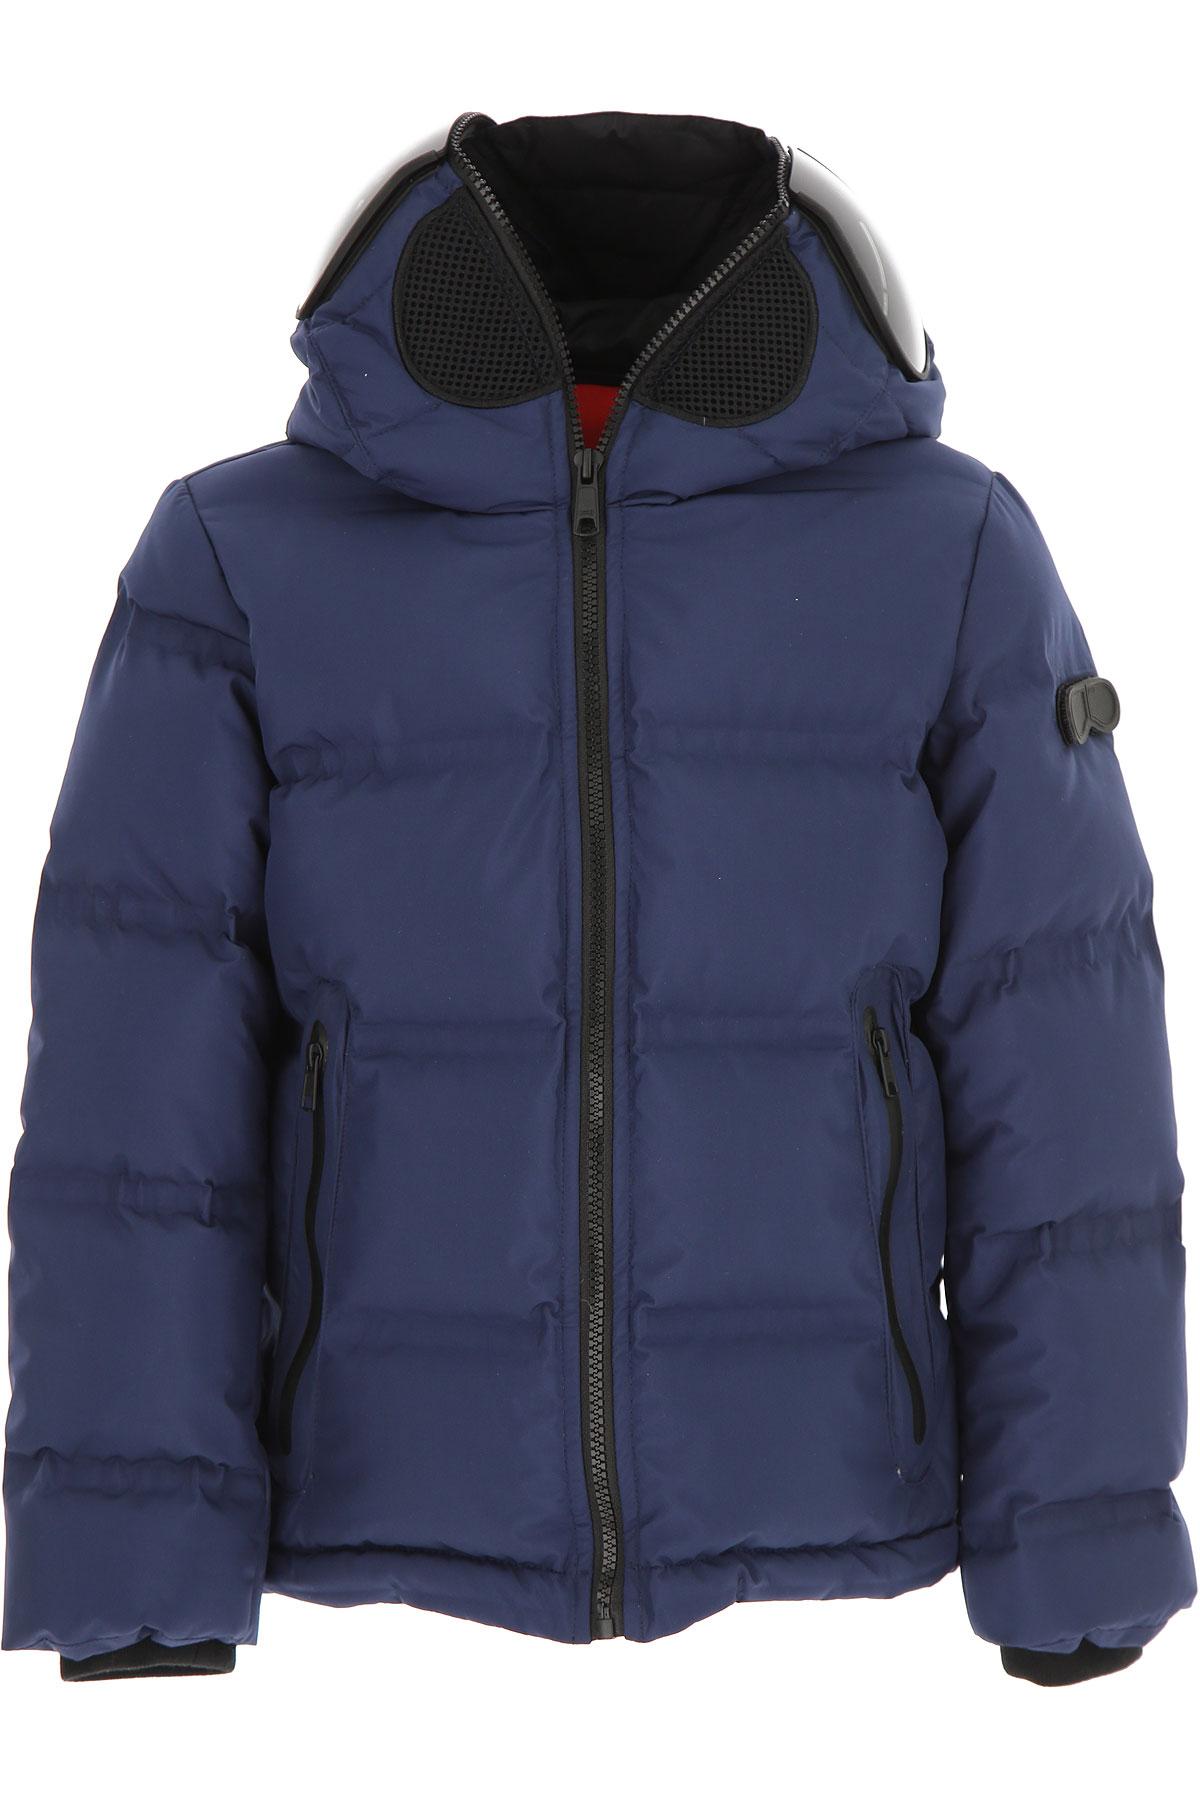 Image of Ai Riders On The Storm Boys Down Jacket for Kids, Puffer Ski Jacket, Night Blue, polyester, 2017, 10Y 14Y 16Y 4Y 6Y 8Y